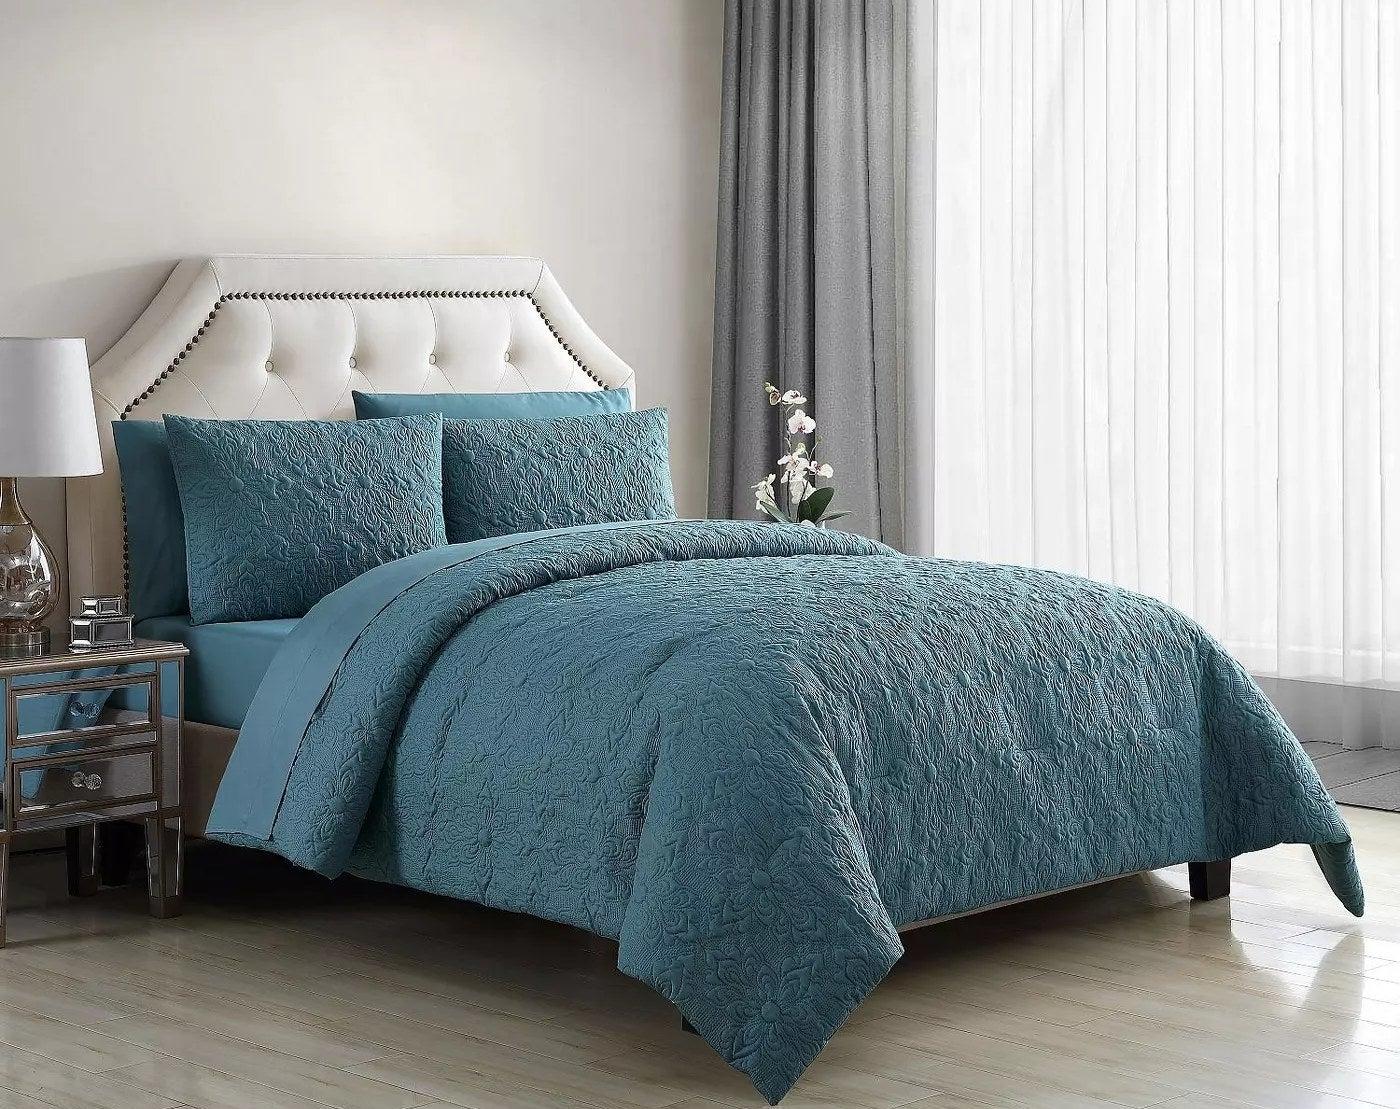 The greenish-blue, embossed quilt set